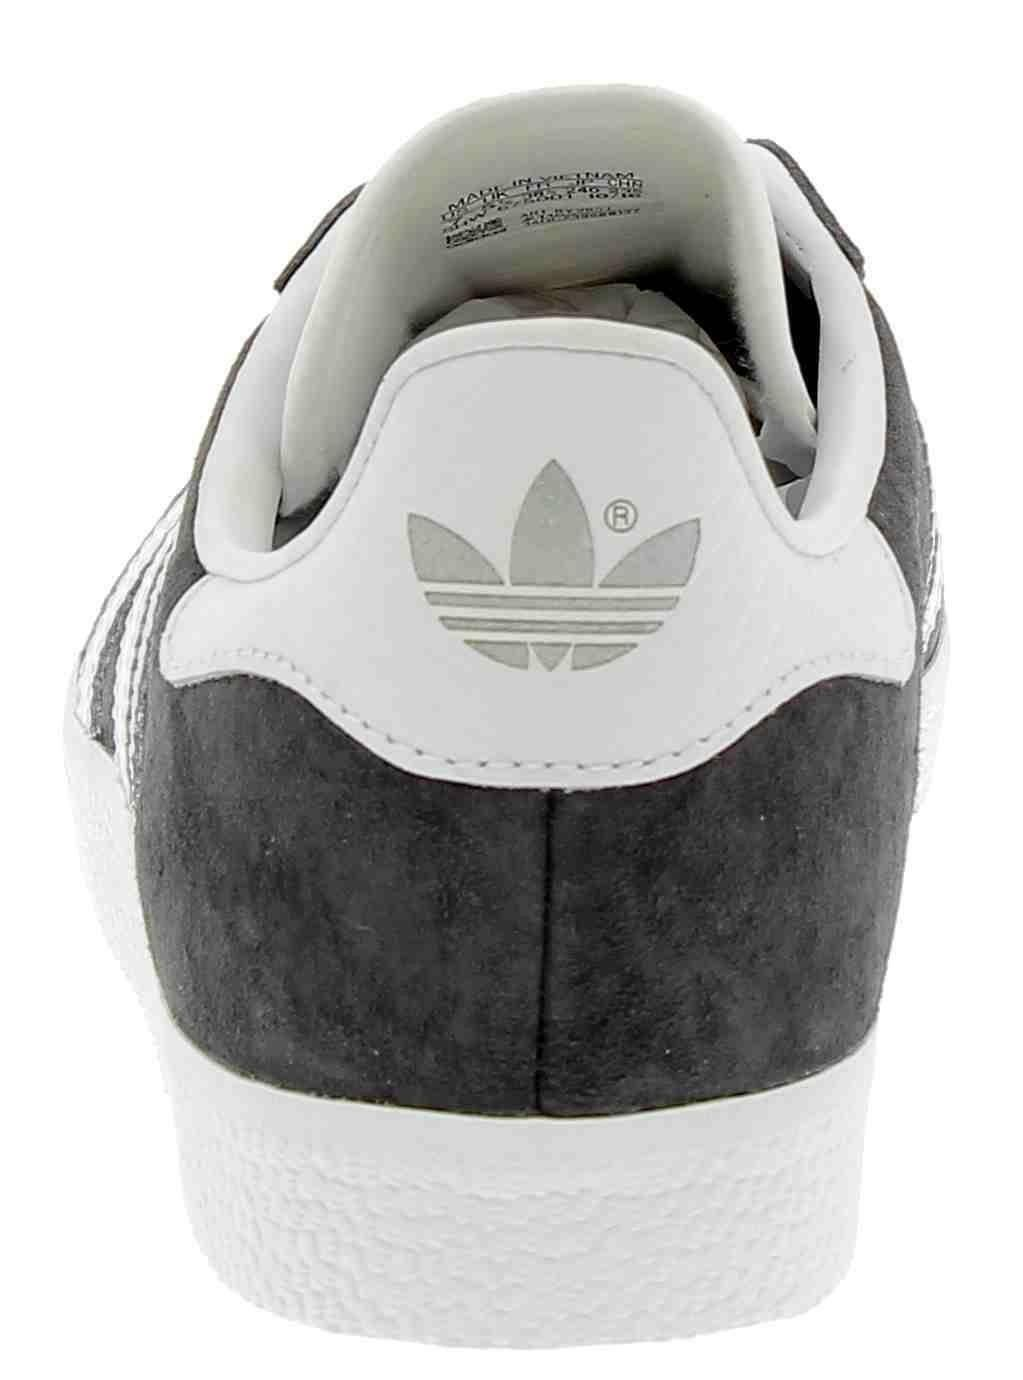 adidas adidas gazelle scarpe sportive uomo grigie pelle pitonata